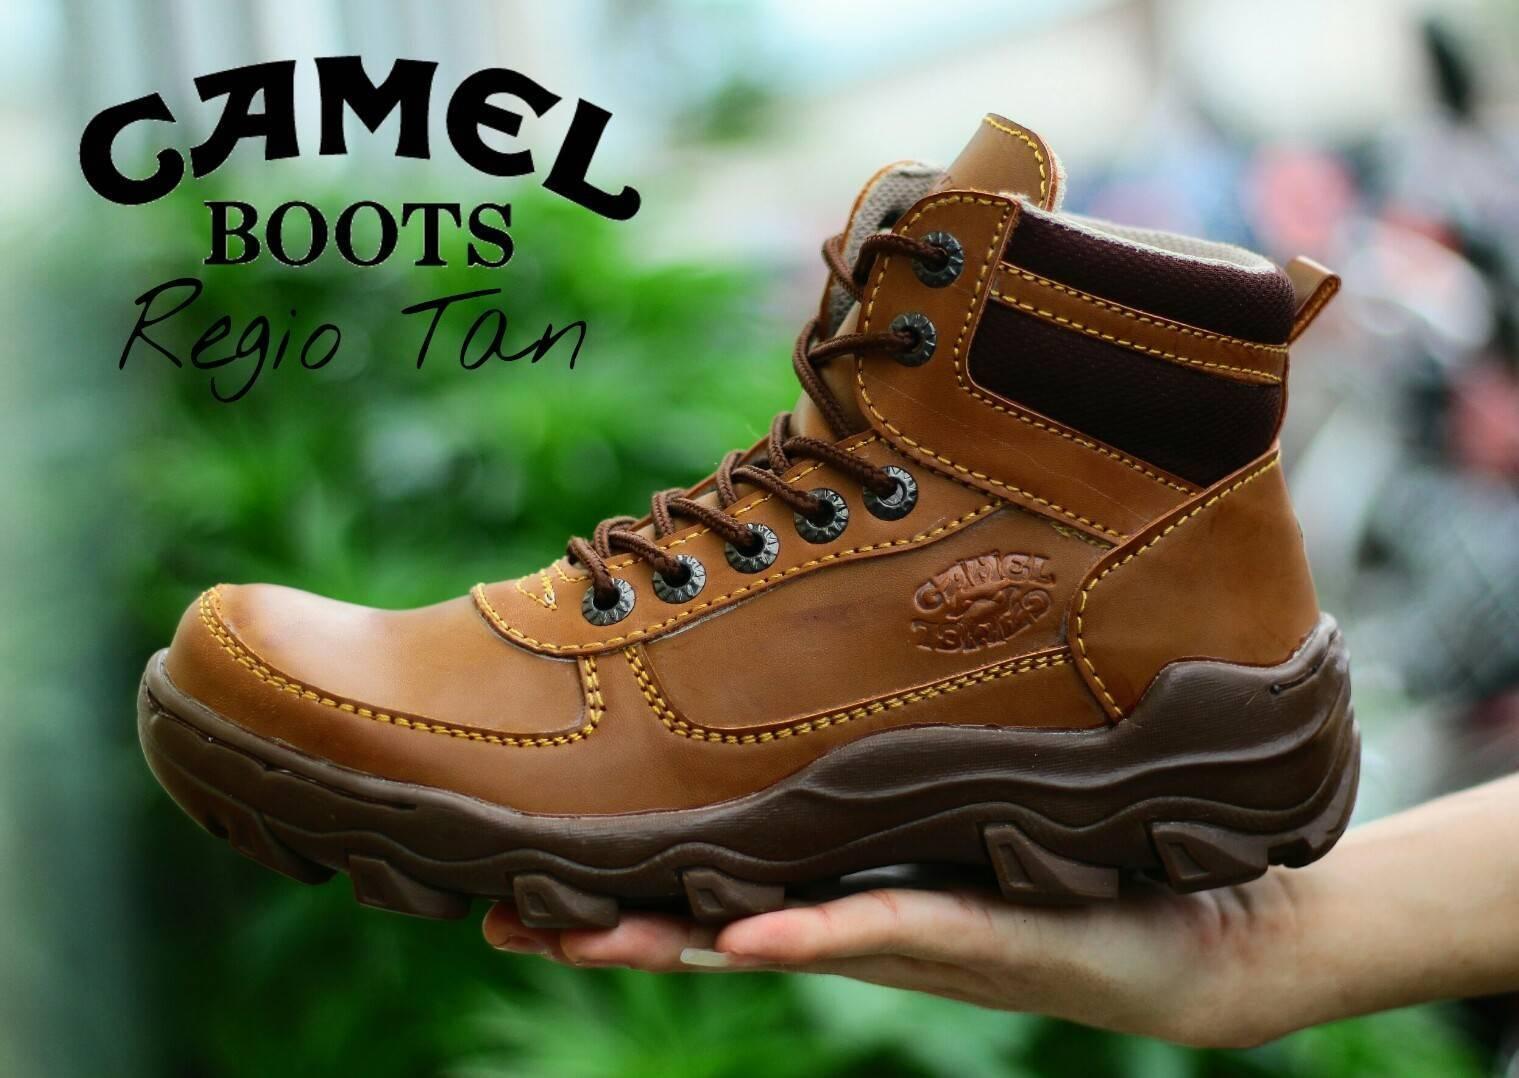 Camel Original - Sepatu boots pria safety camel kerja formal santai proyek  lapangan outdoor hiking 8432d44609